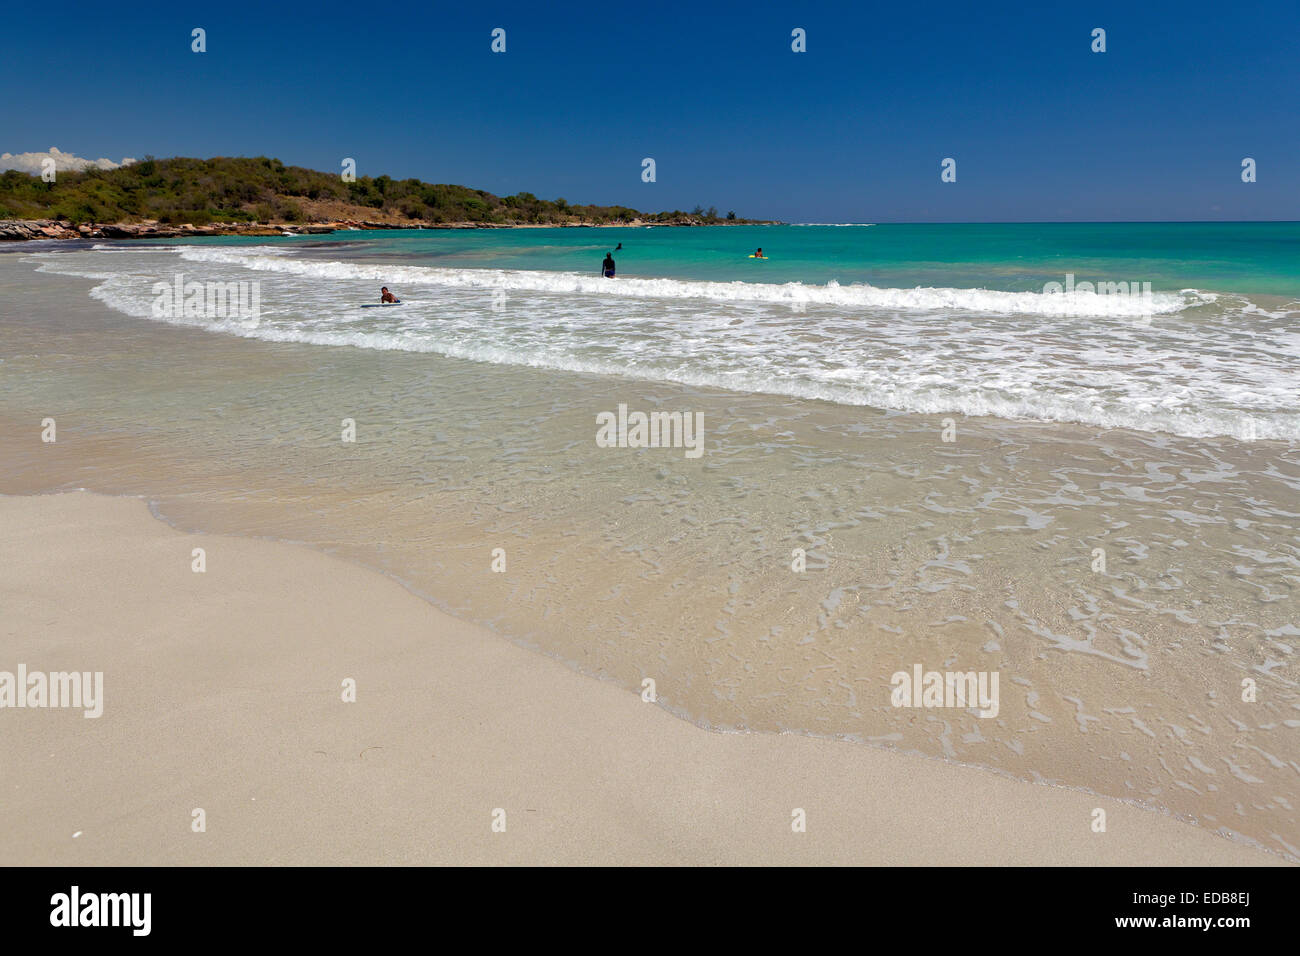 Gentle Waves, Atolladora Beach, Puerto Rico - Stock Image